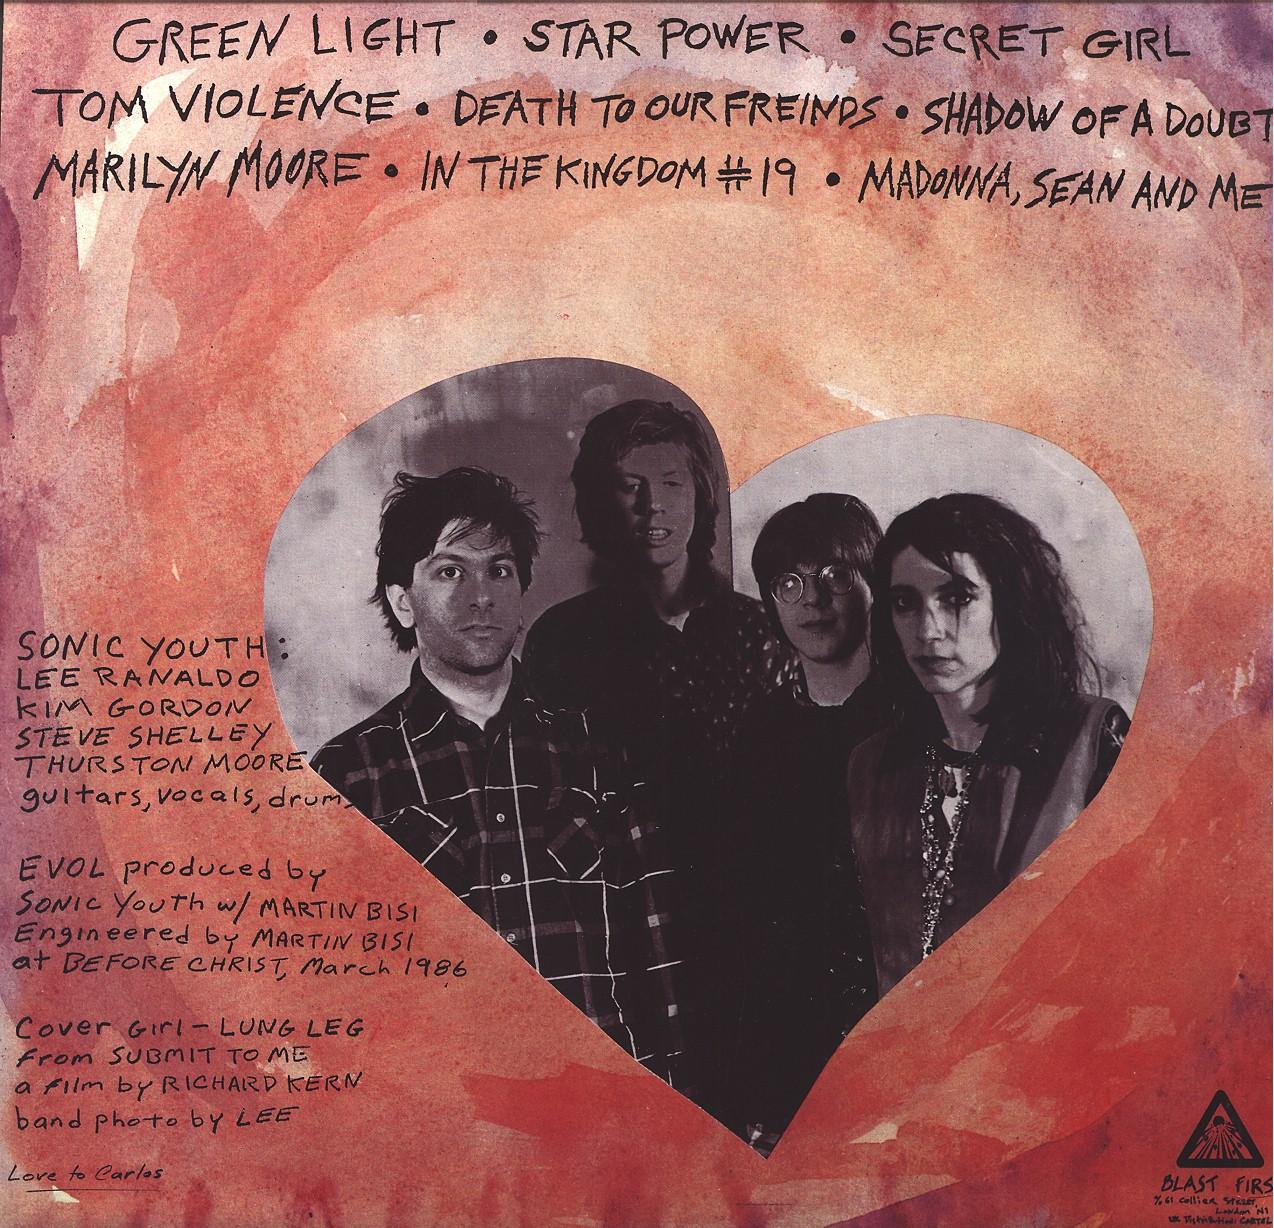 Evol (Sonic Youth album) - Wikipedia - 569.3KB